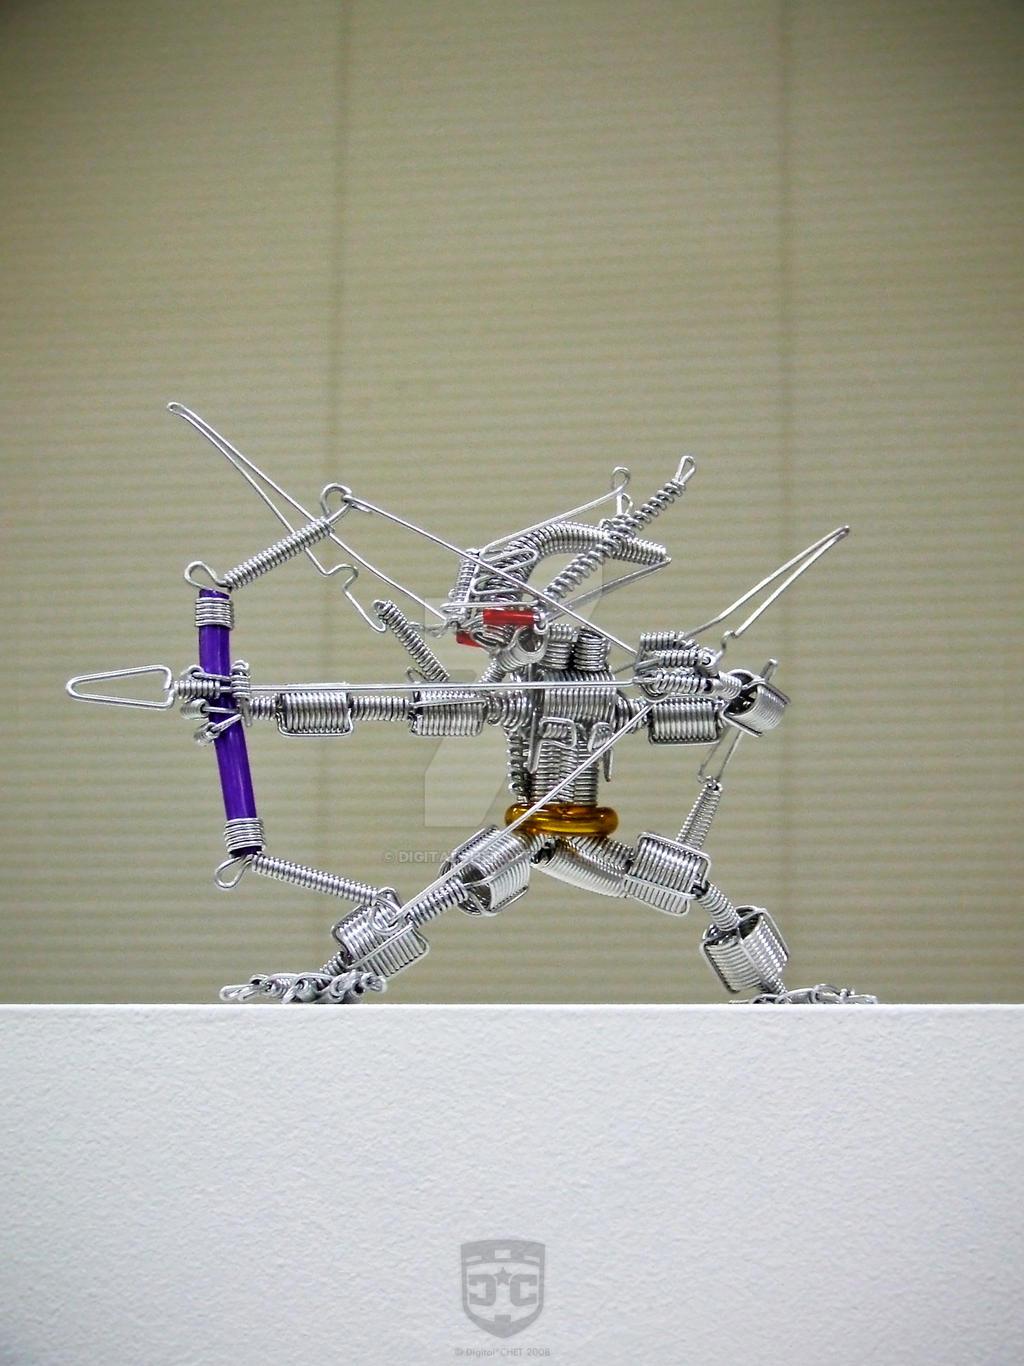 The Wire Archer by digitalchet